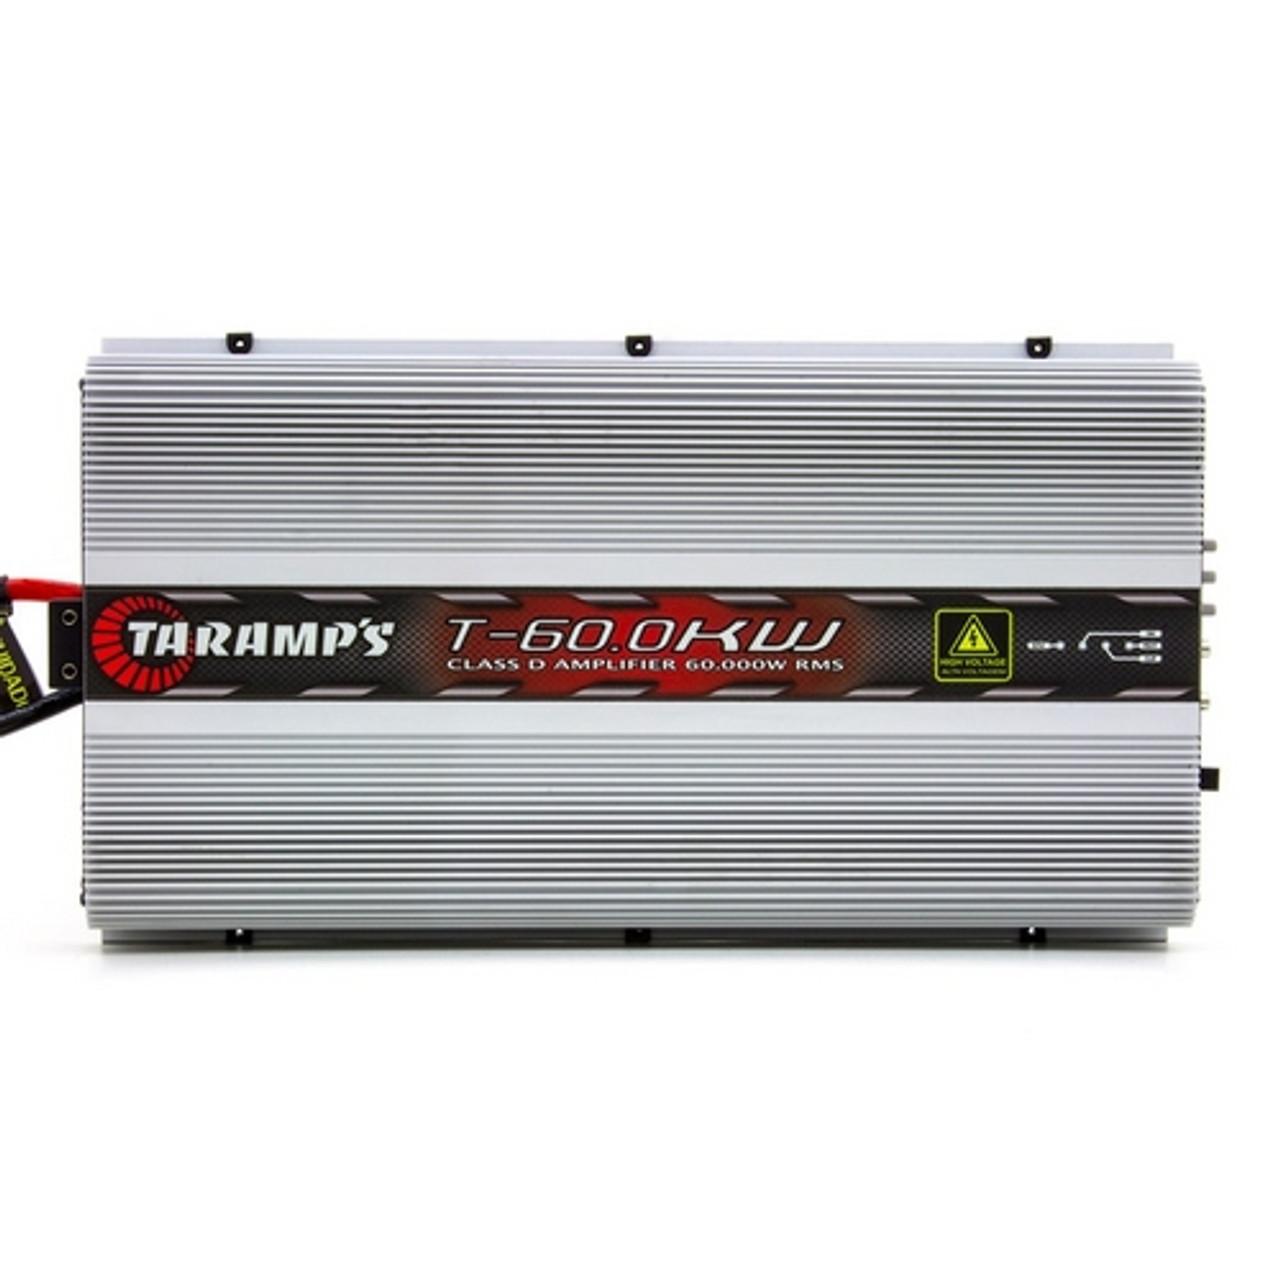 Taramp's T 60 0KW High Power Car Amplifier - 0 5 Ohm